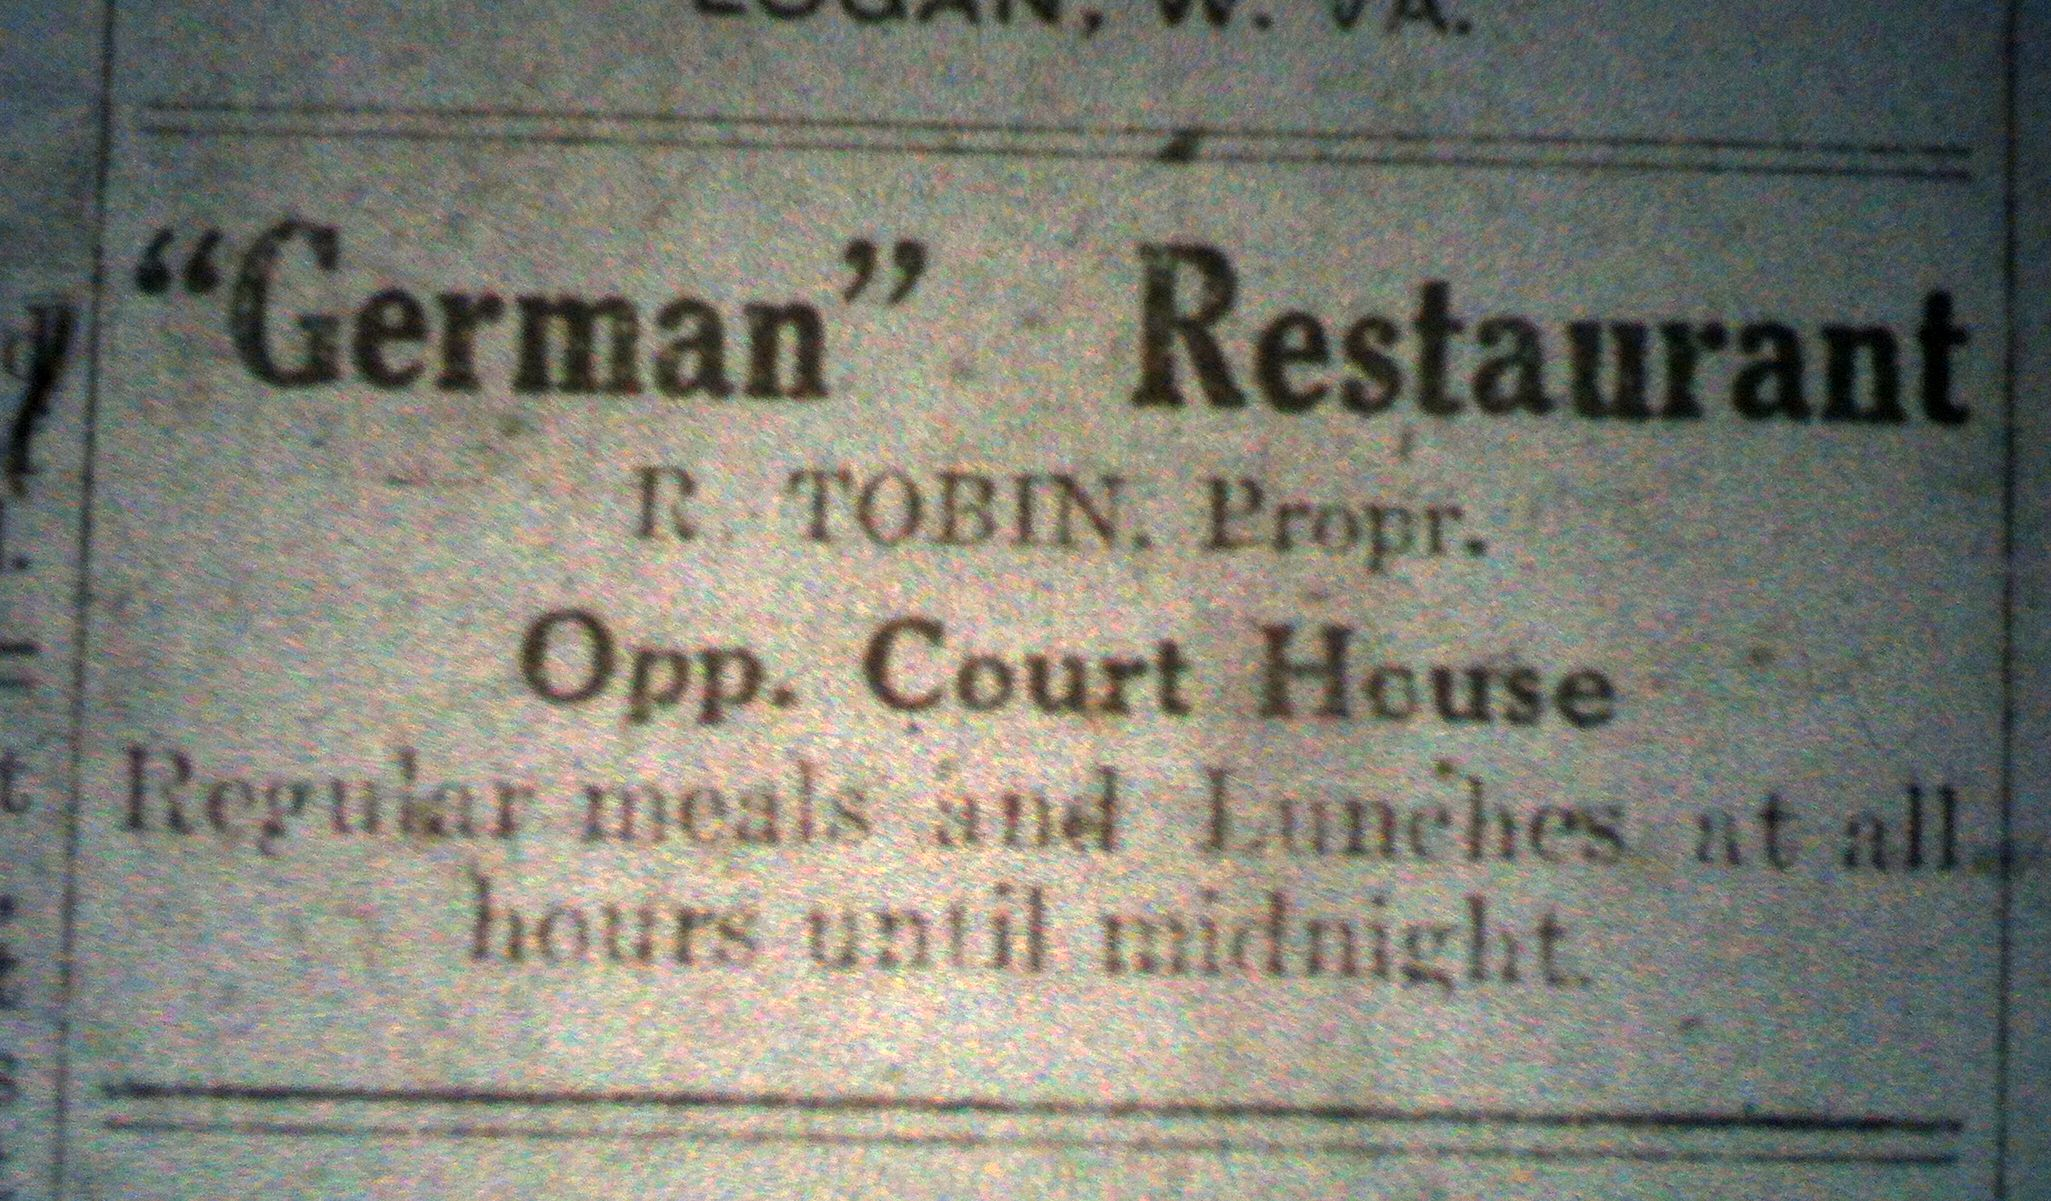 German Restaurant Ad LB 06.20.1913.JPG